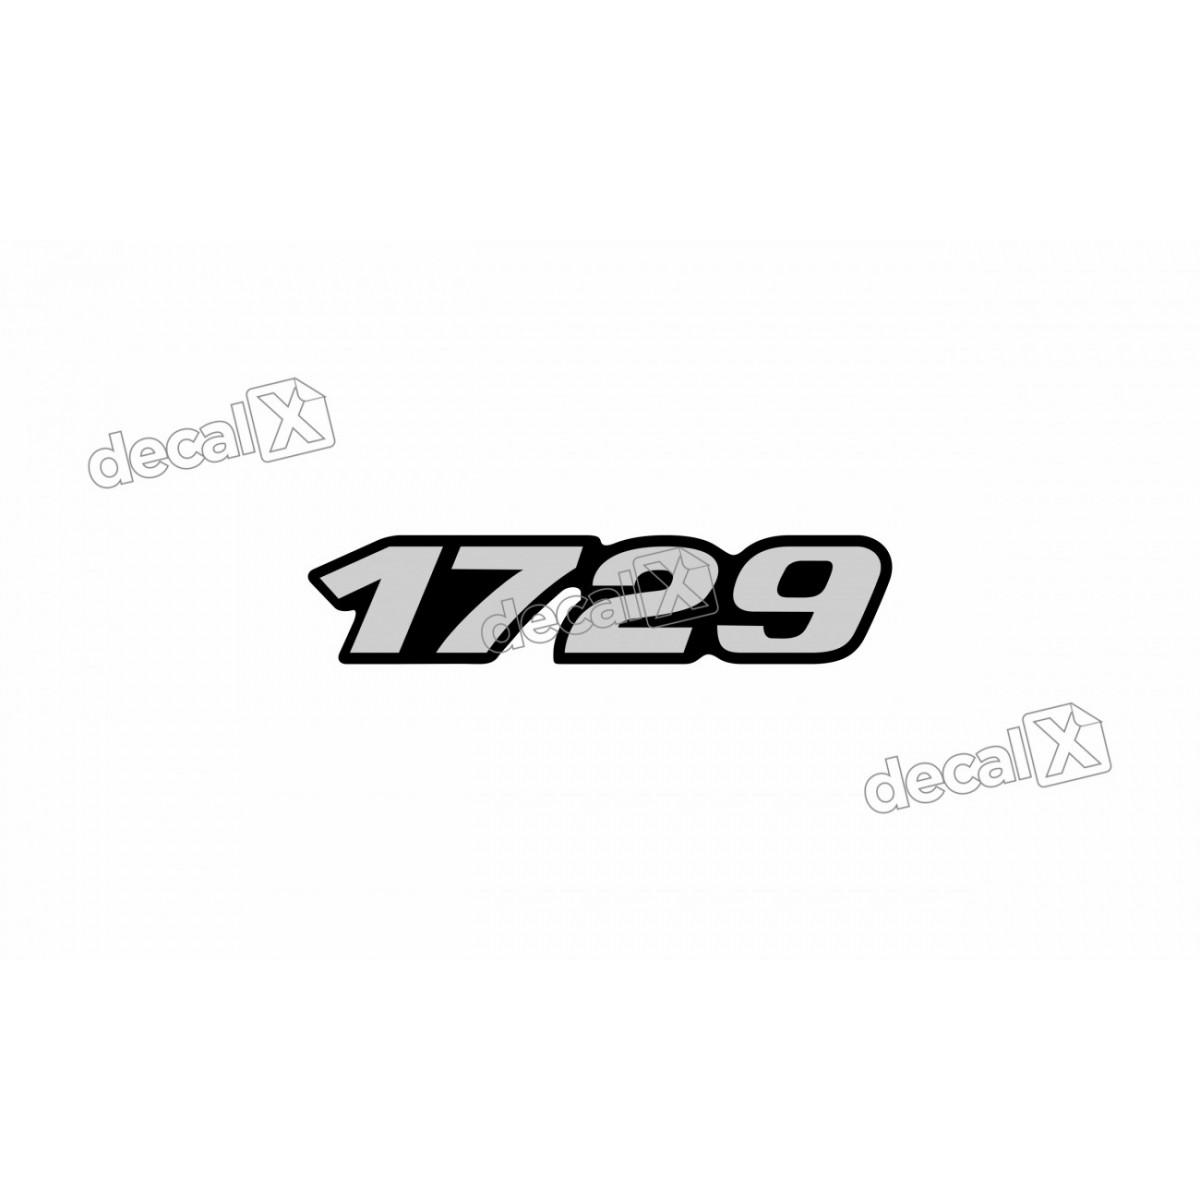 Adesivo Emblema Resinado Mercedes 1729 Cm64 Decalx